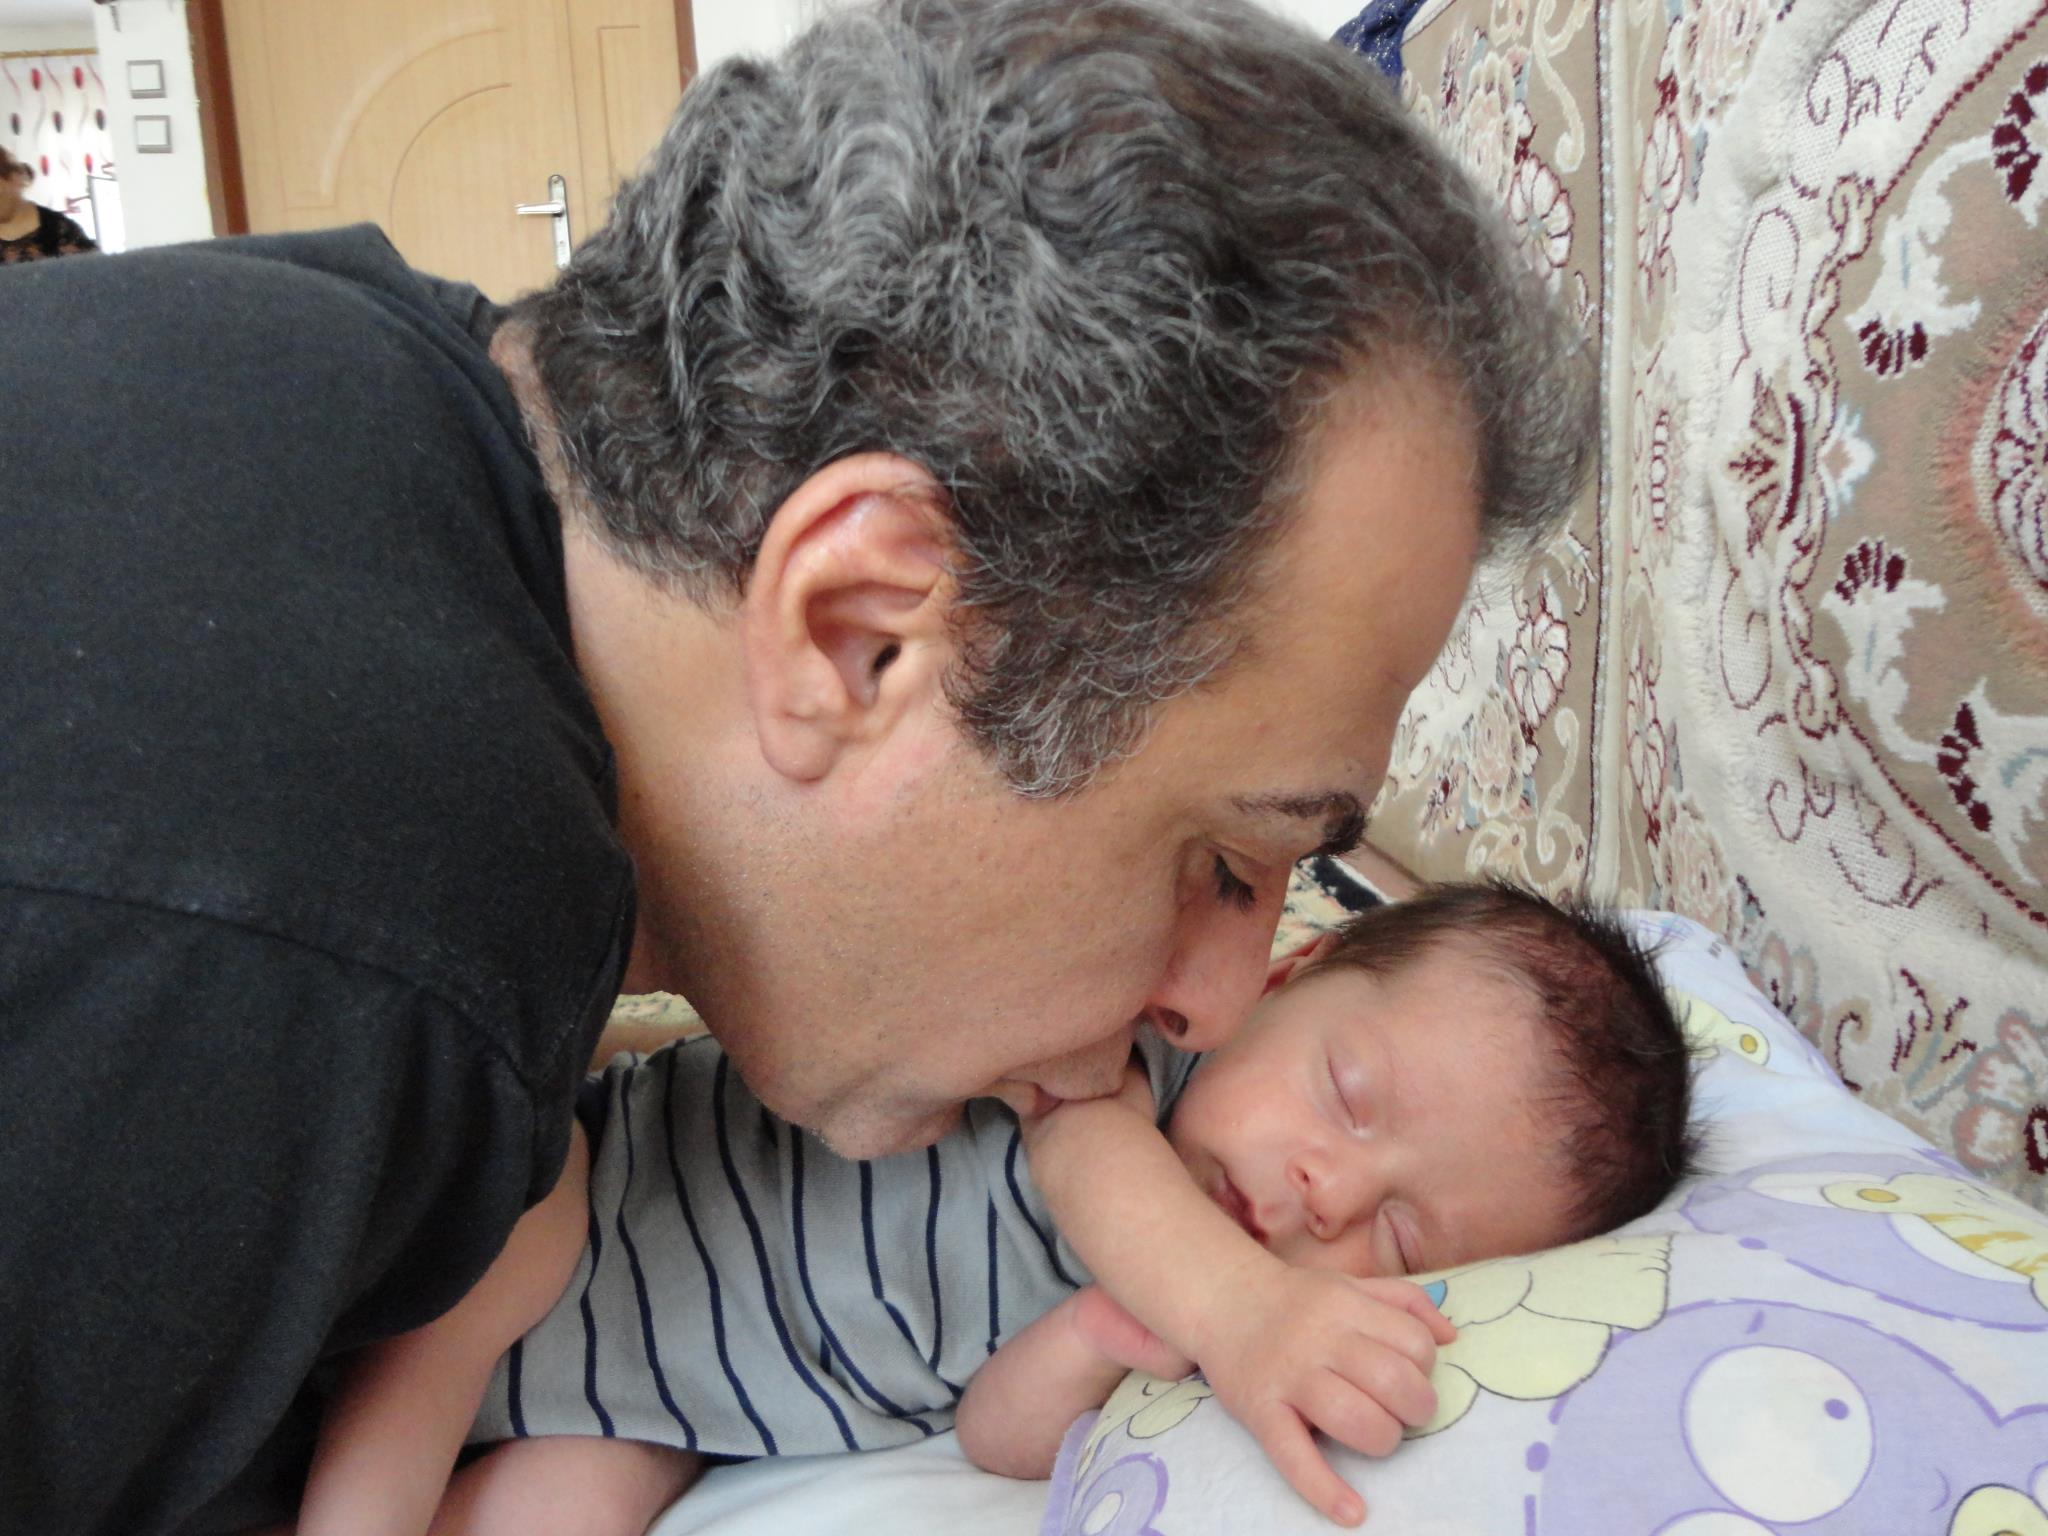 Behrouz with his newborn son, Harmang